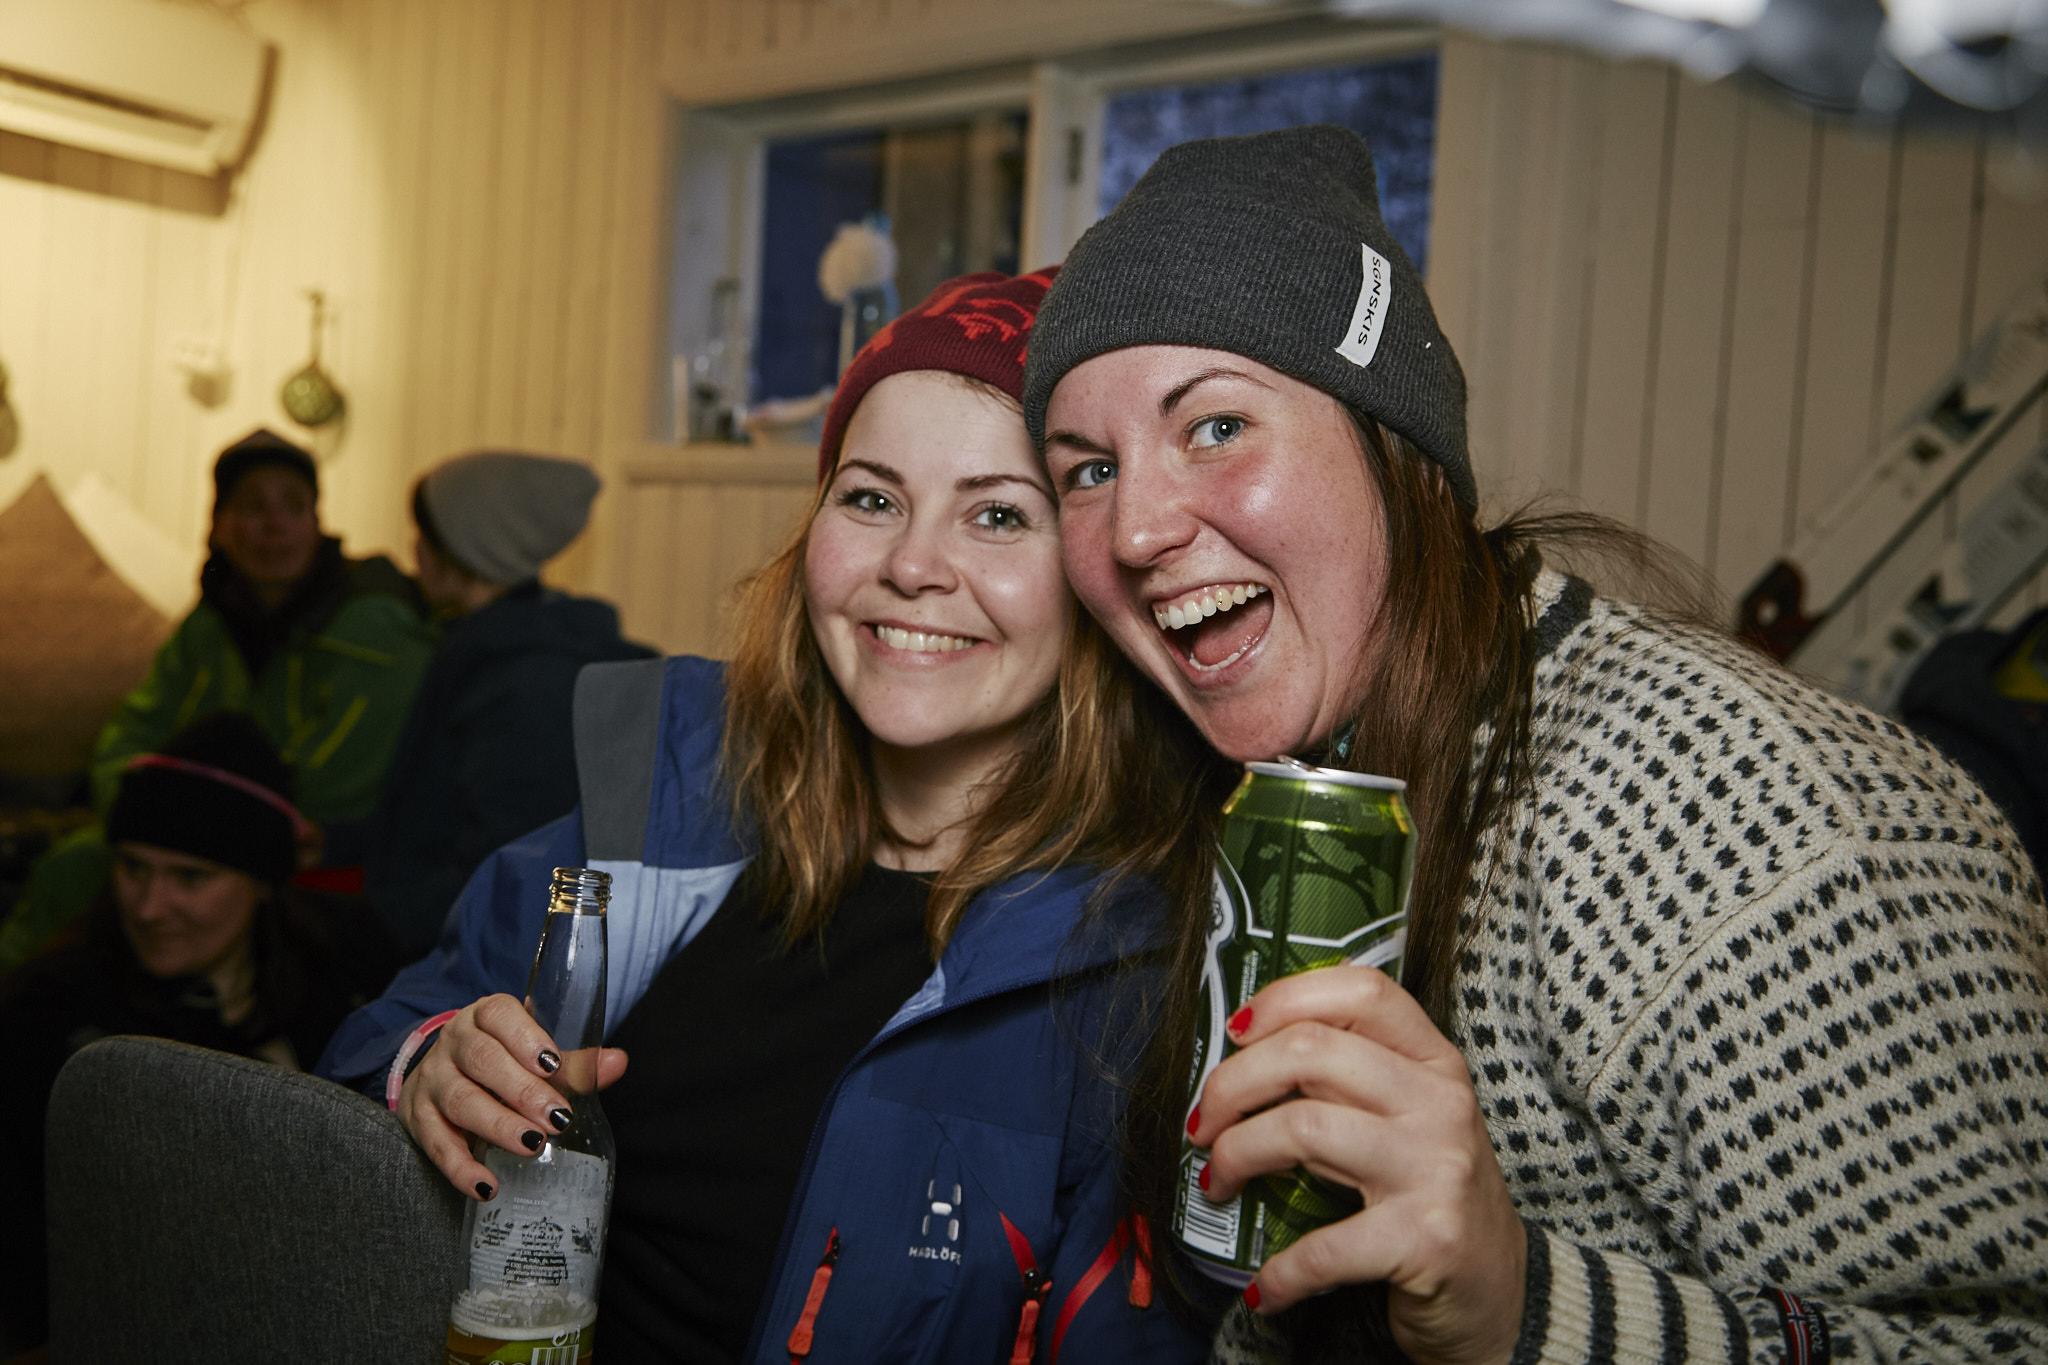 2018.02.22-Fjellsportfestival-Afterski-002.jpg